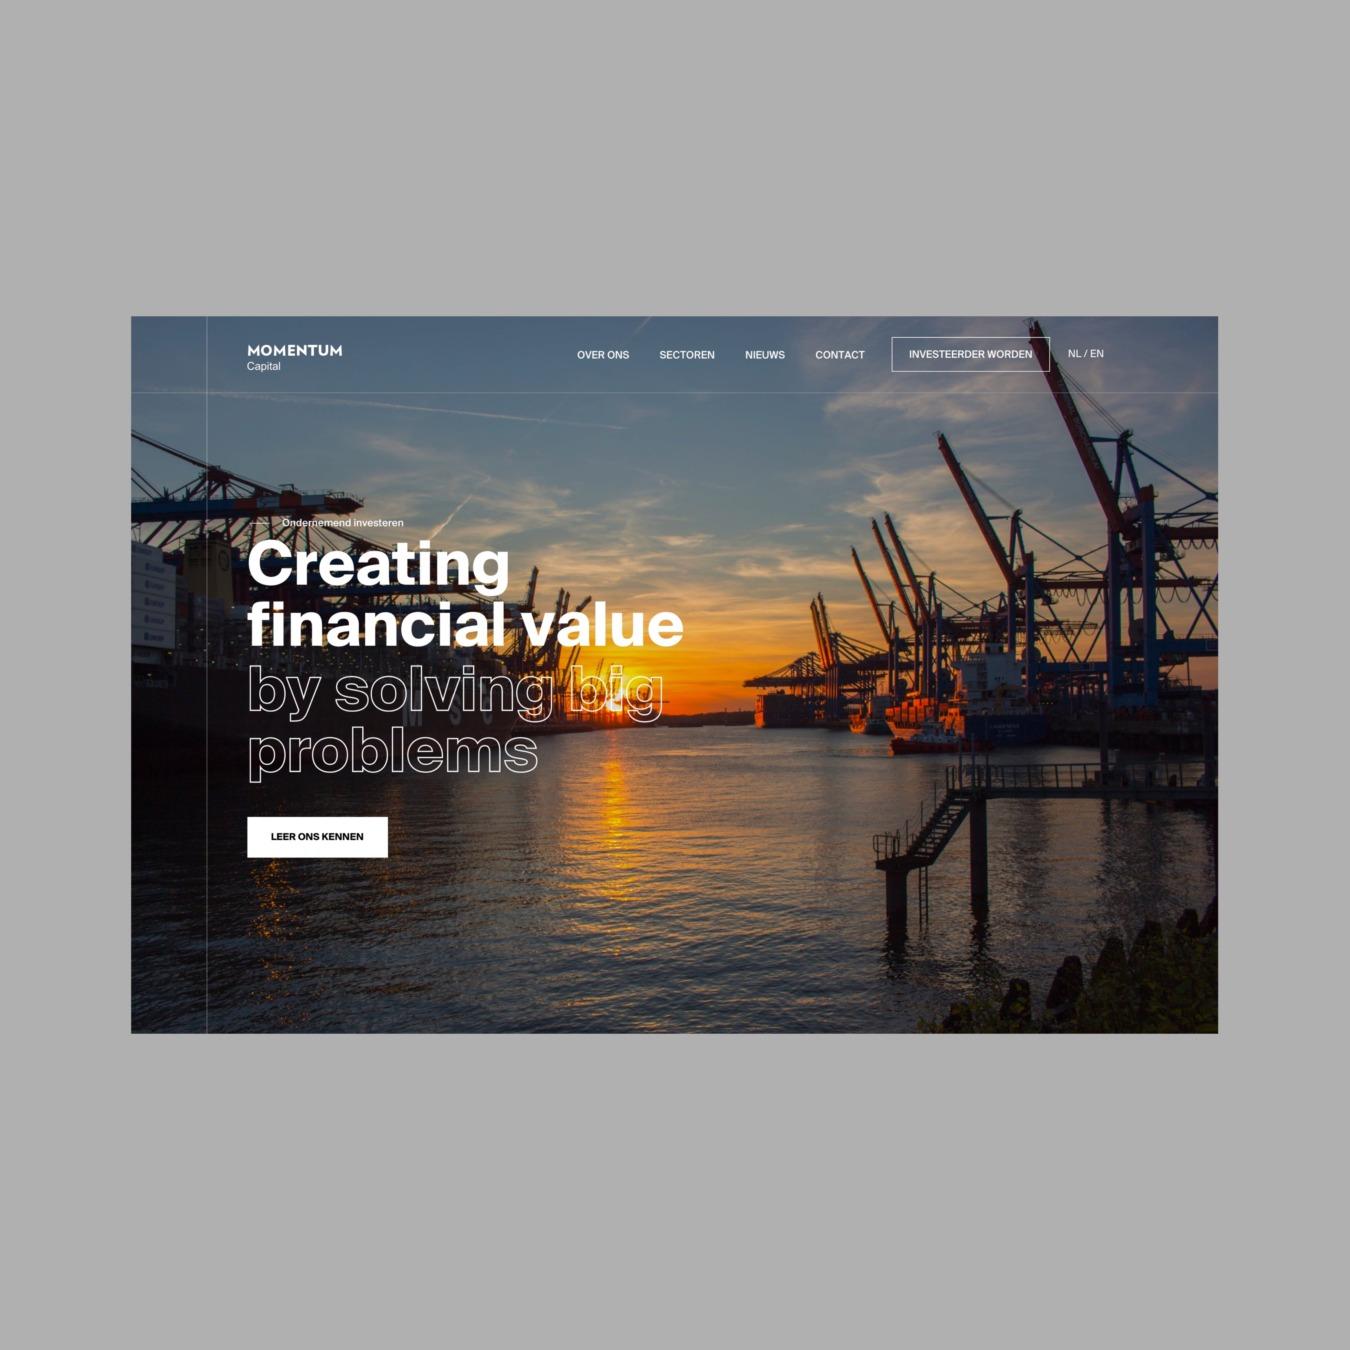 Corporate website als Momentum Capital